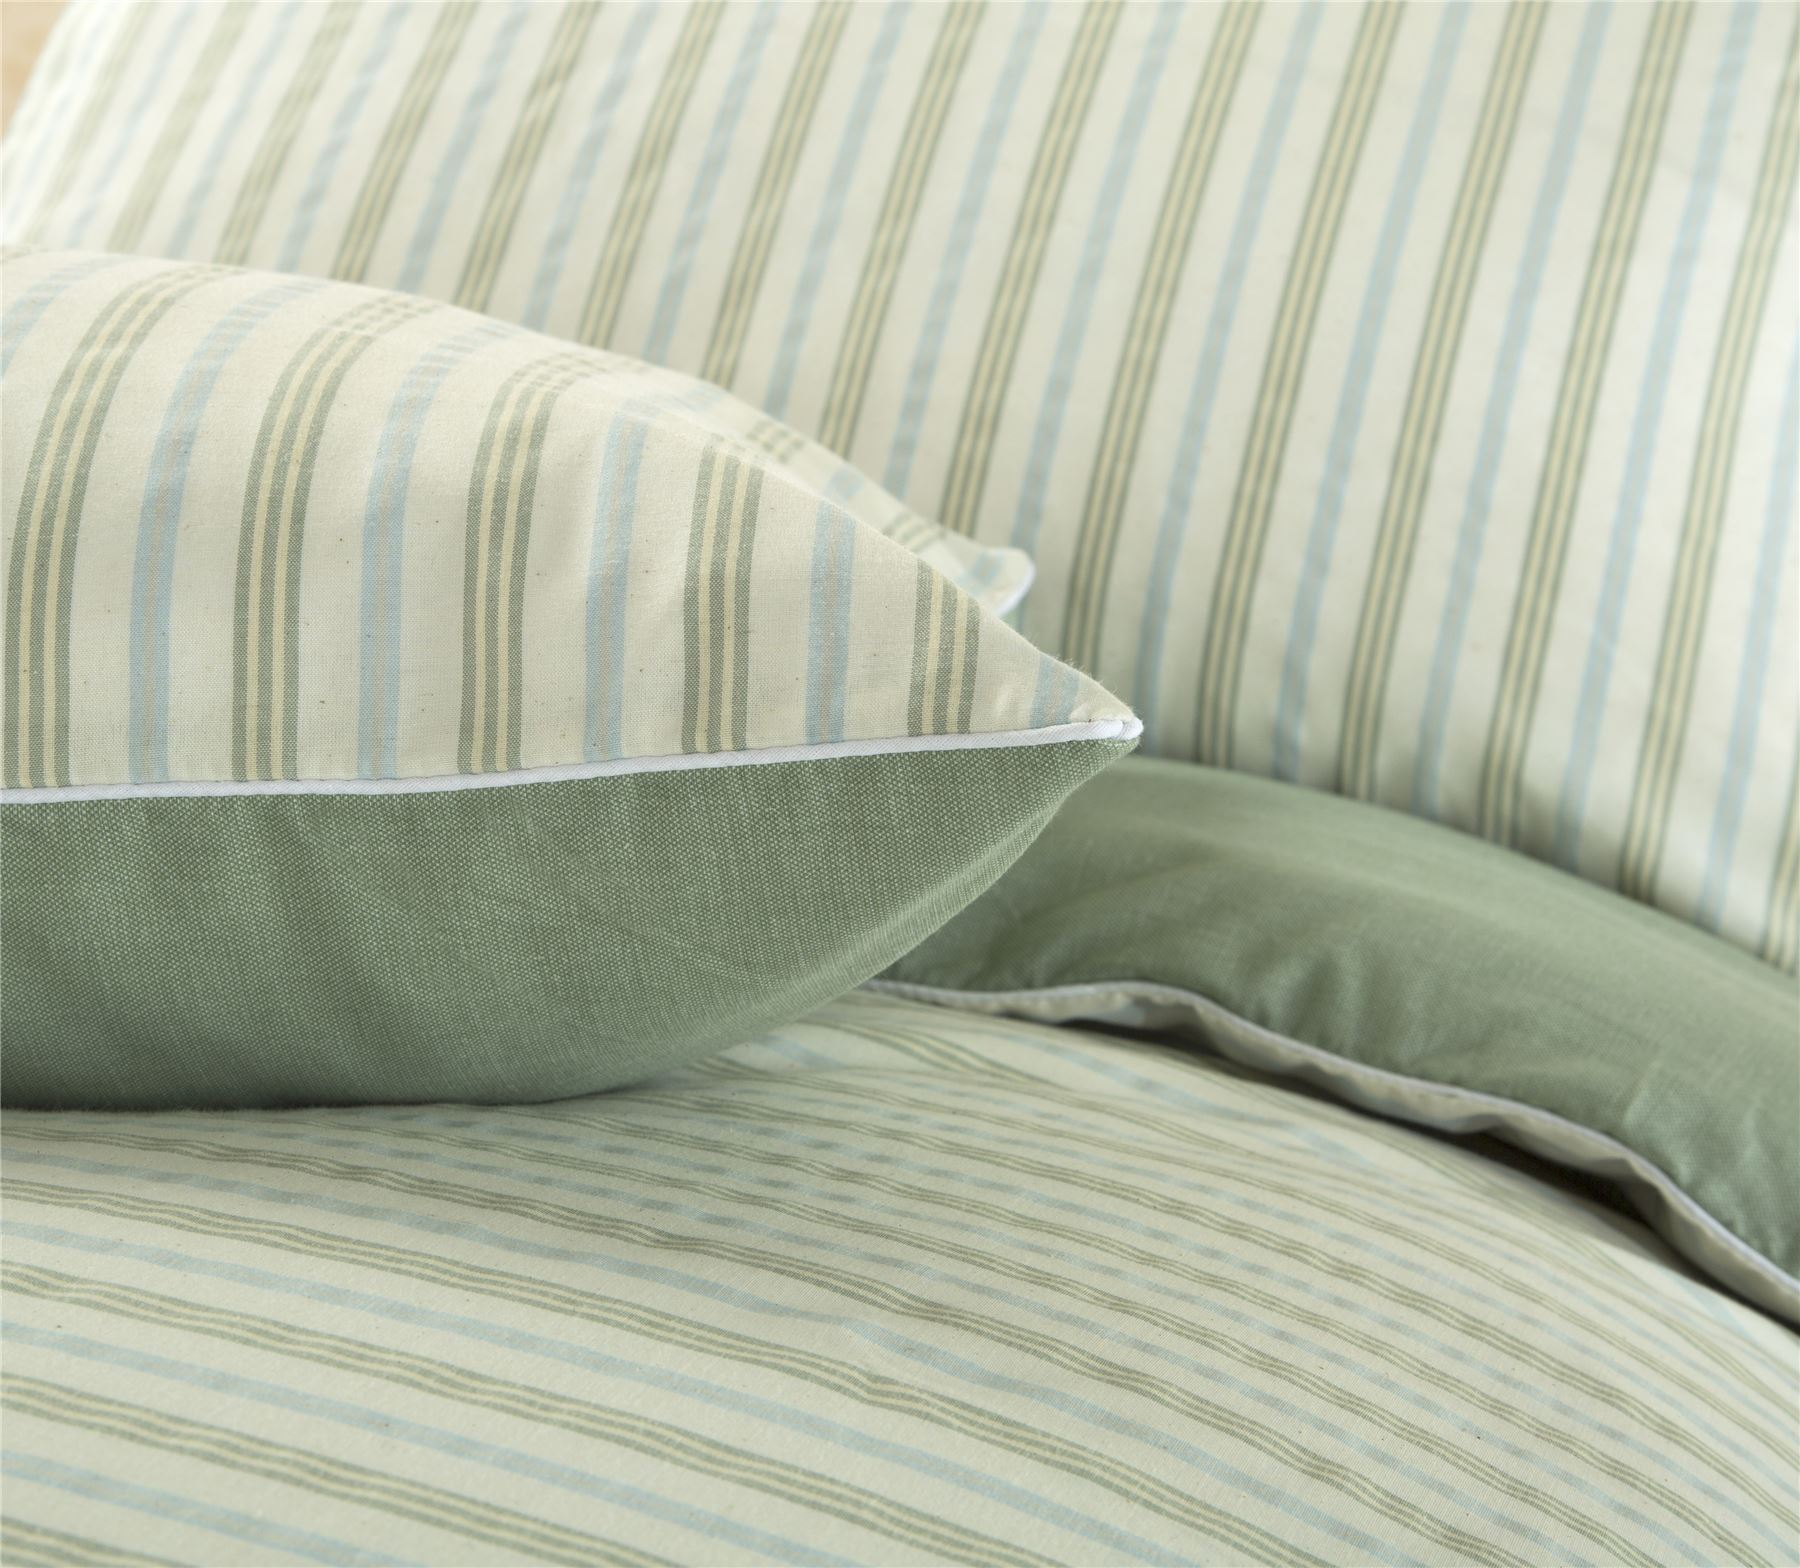 Hilo-de-algodon-de-lujo-Rico-Suave-Chambray-tenido-de-Cubierta-de-edredon-a-rayas-de-tejido-a-rayas miniatura 32